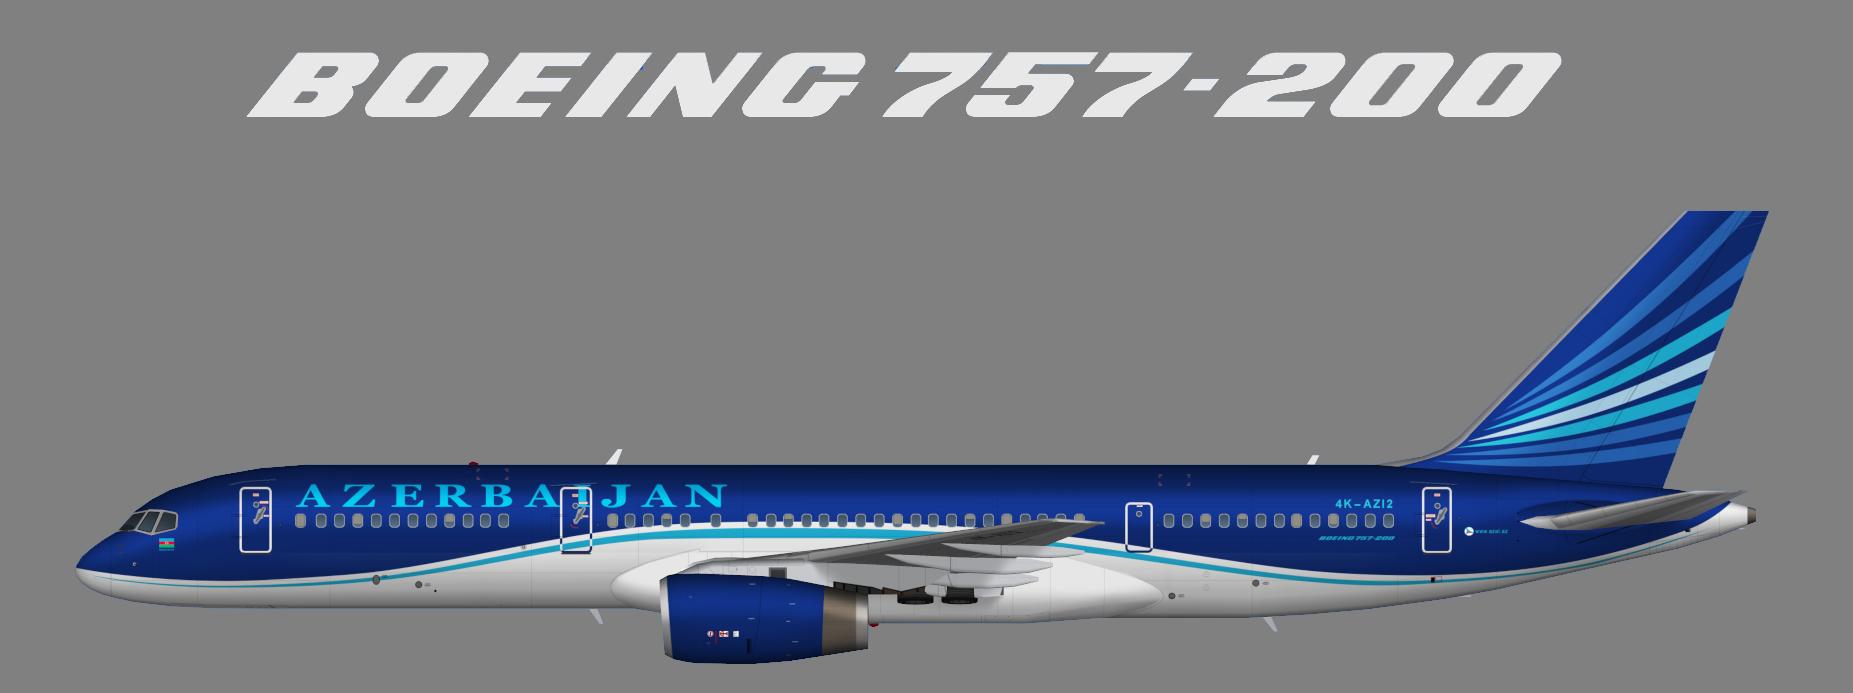 Azerbaijan Airlines (AZAL) Boeing 757-200